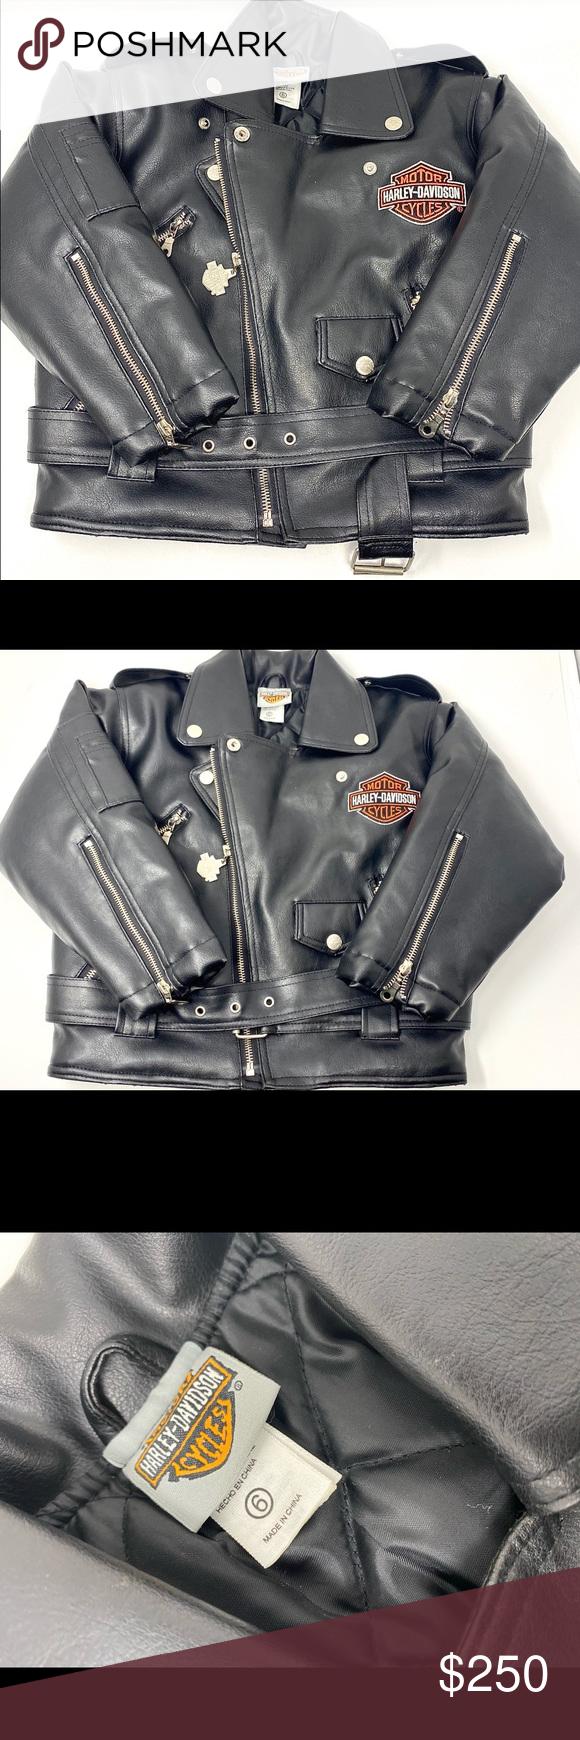 Harley Davidson Leather Jacket Kids Size 6 Black Harley Davidson Leather Jacket Kids Size 6 Black Ha Harley Davidson Leather Jackets Kids Jacket Fashion Trends [ 1740 x 580 Pixel ]